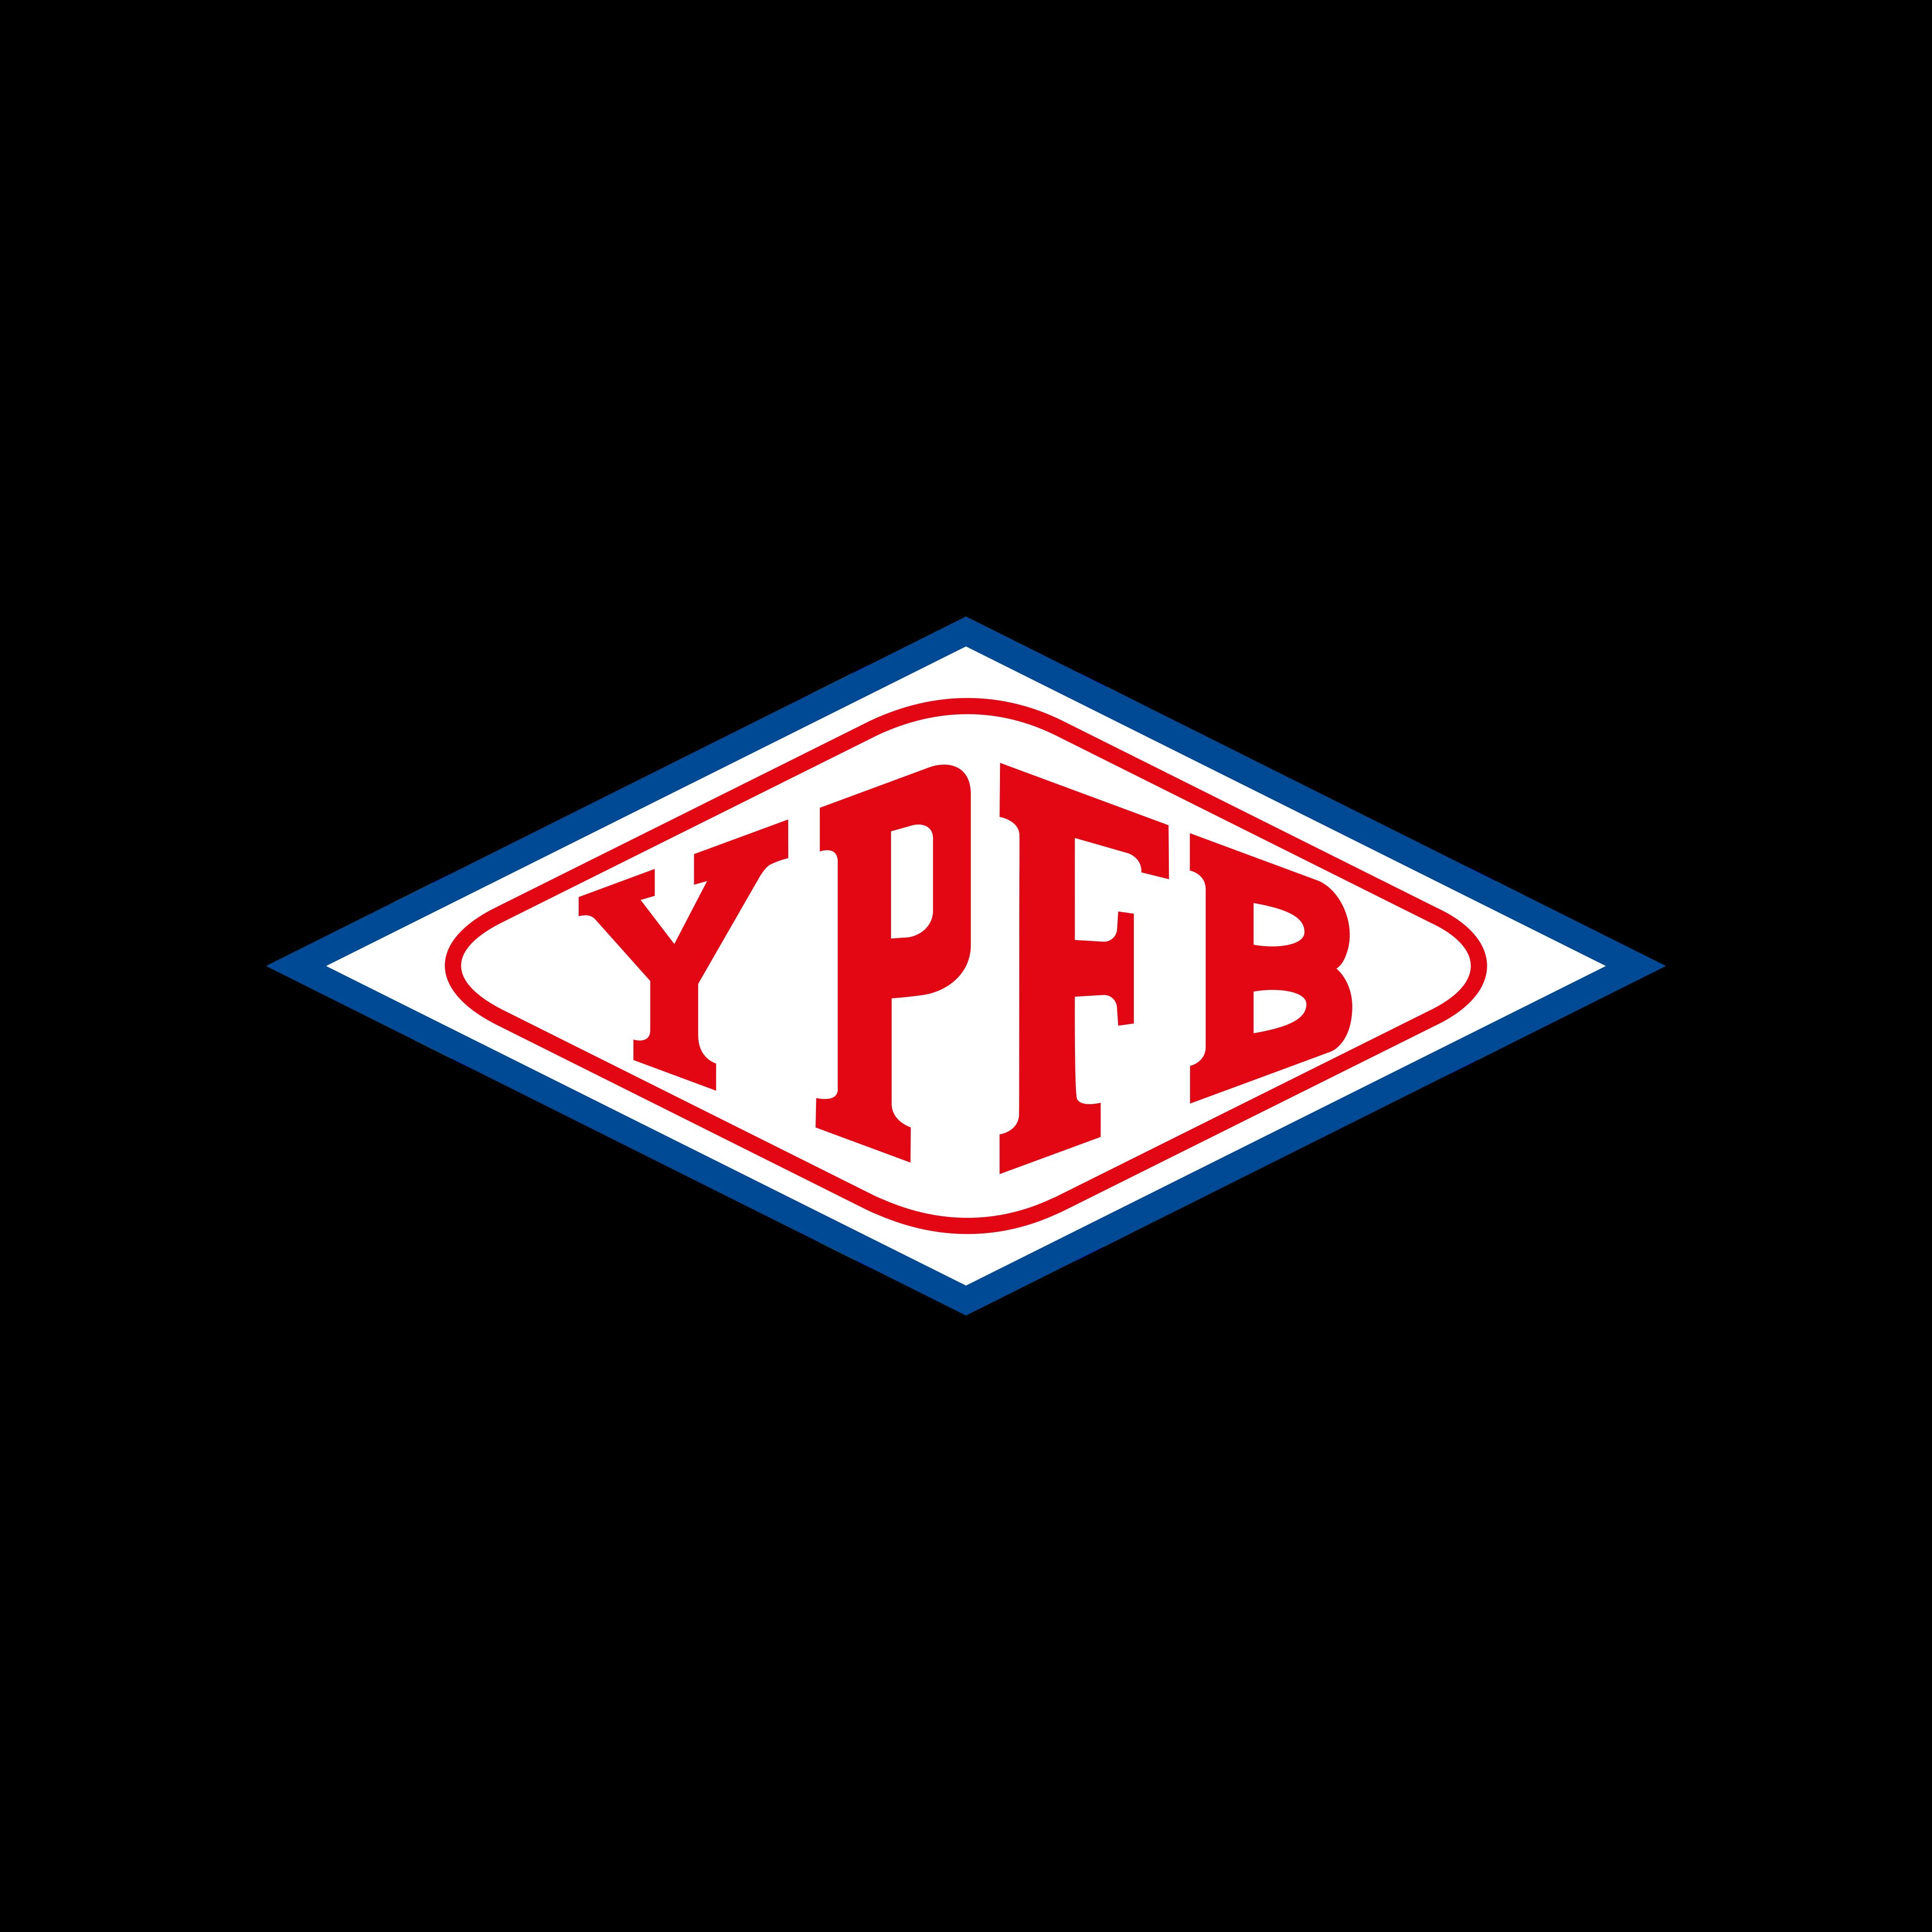 ypfb logo 0 - YPFB Logo